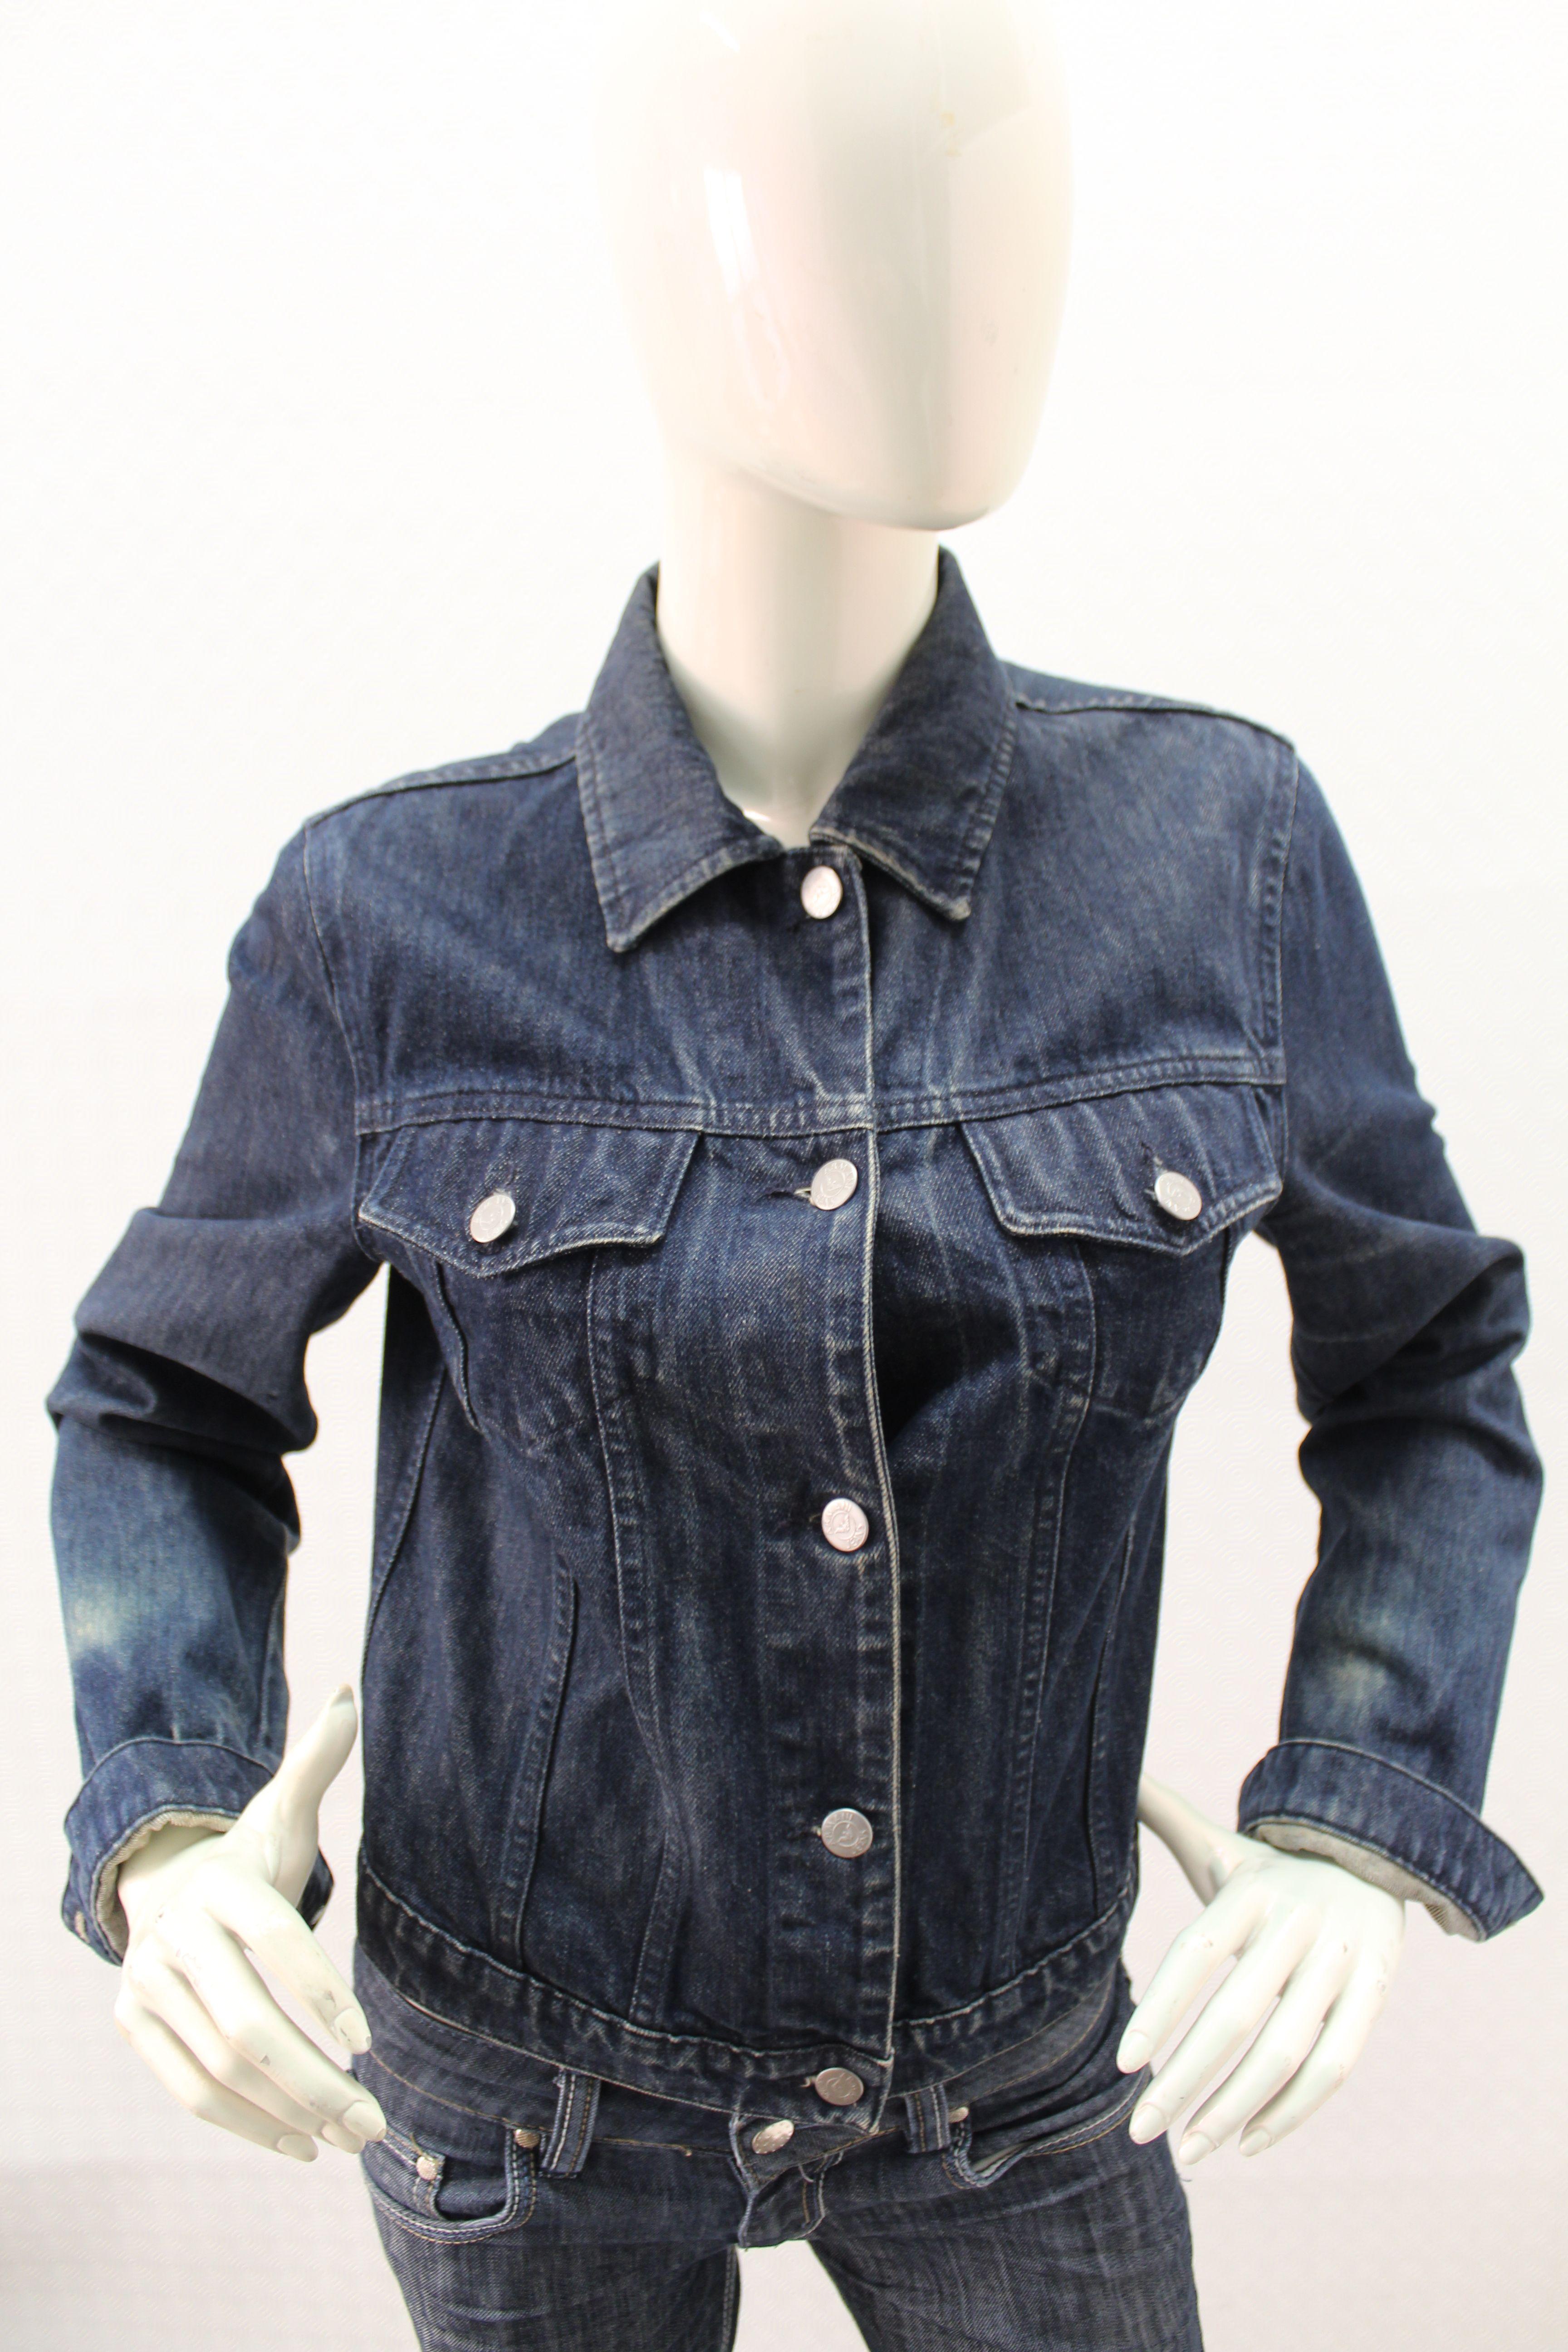 low priced cbc26 ef044 Dettagli su Giubbino ARMANI JEANS Donna Giacca Jacket Woman ...